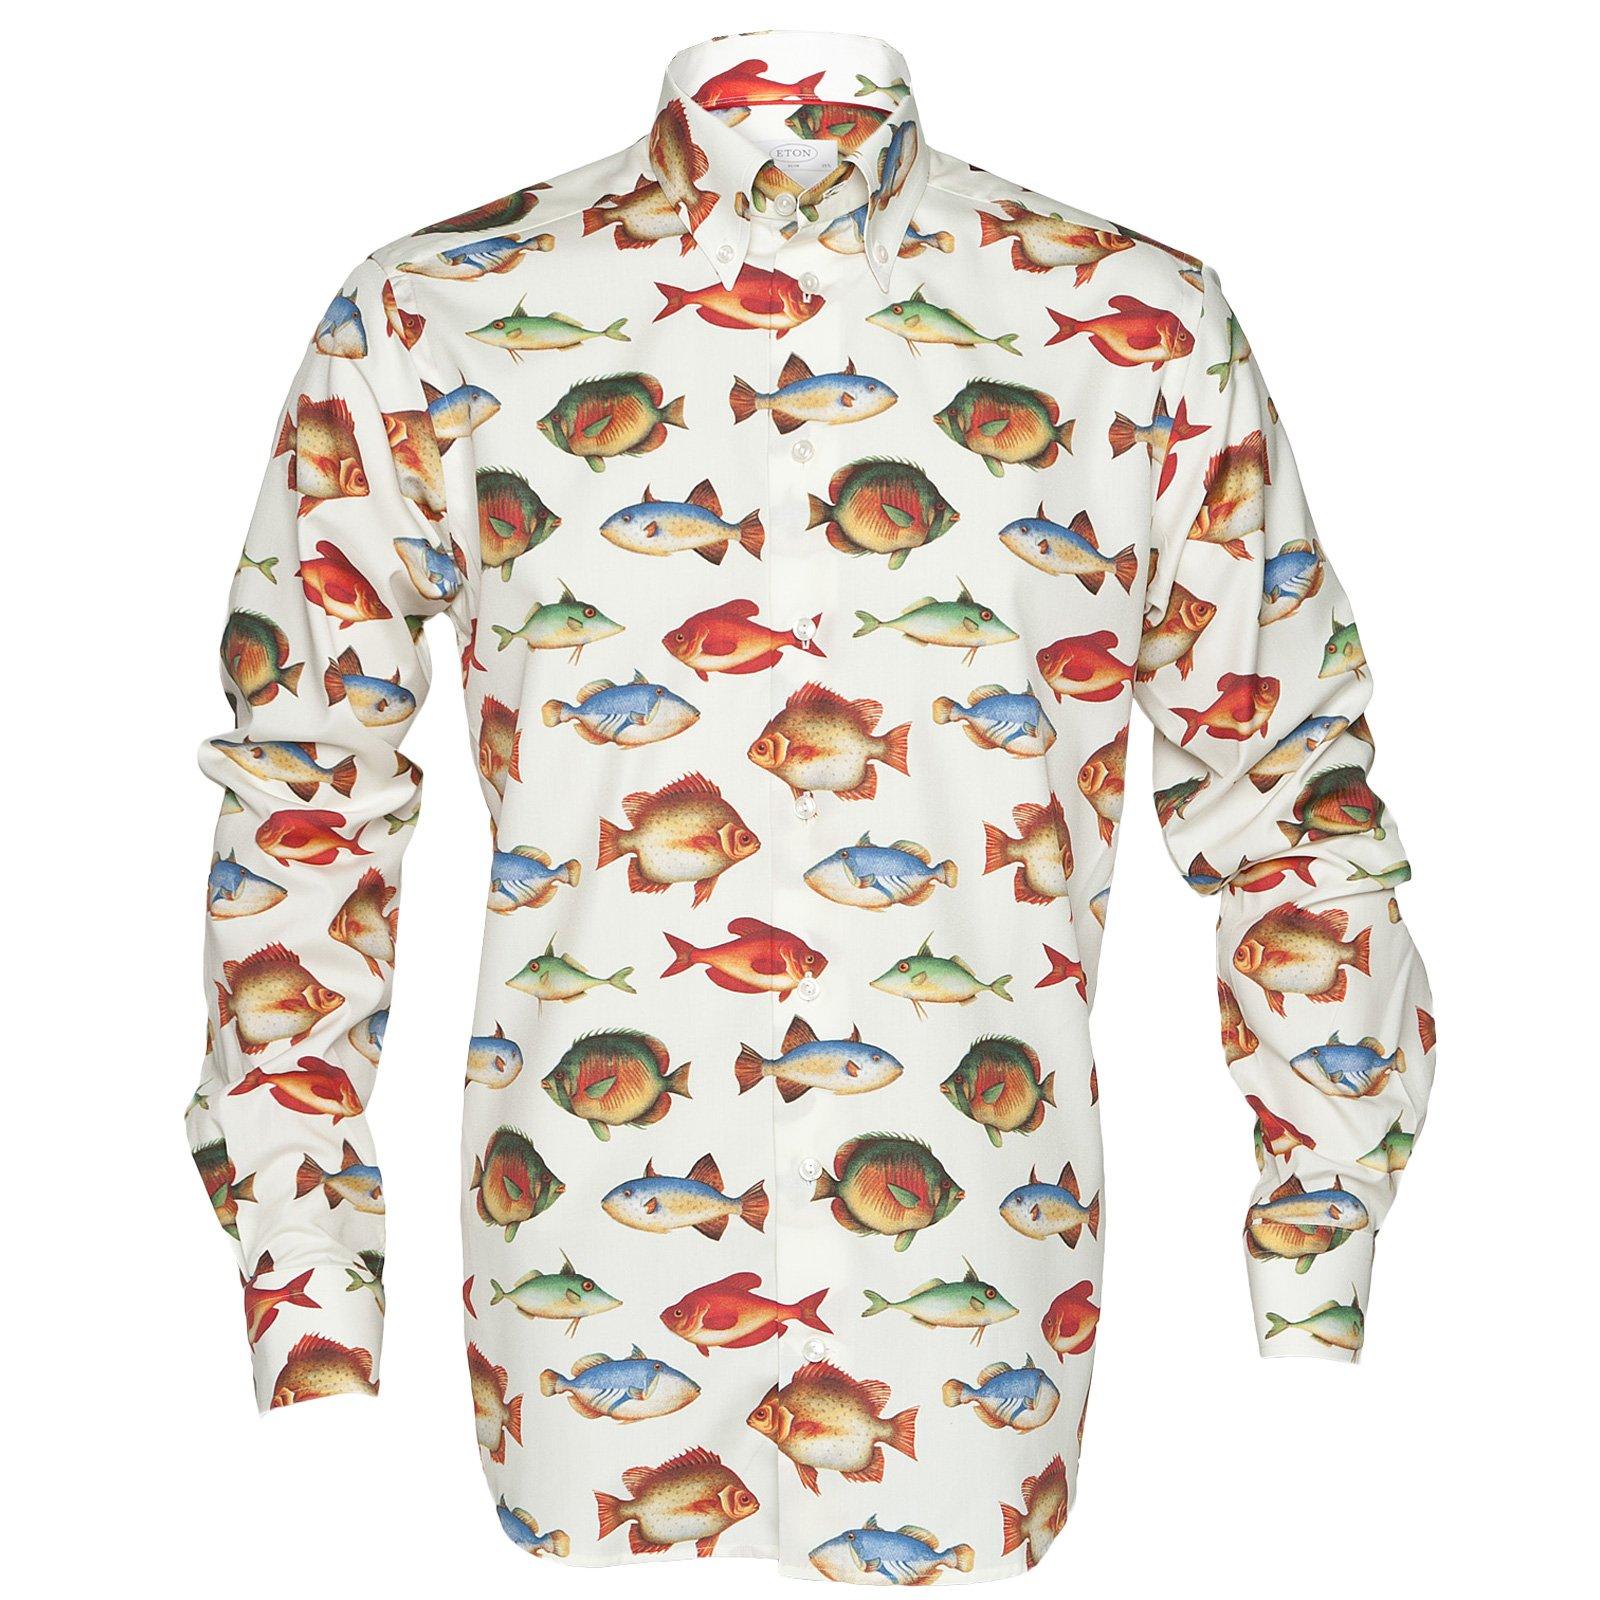 Luxury cotton fish print shirt eton 2013aw c shirts for Fish print shirt